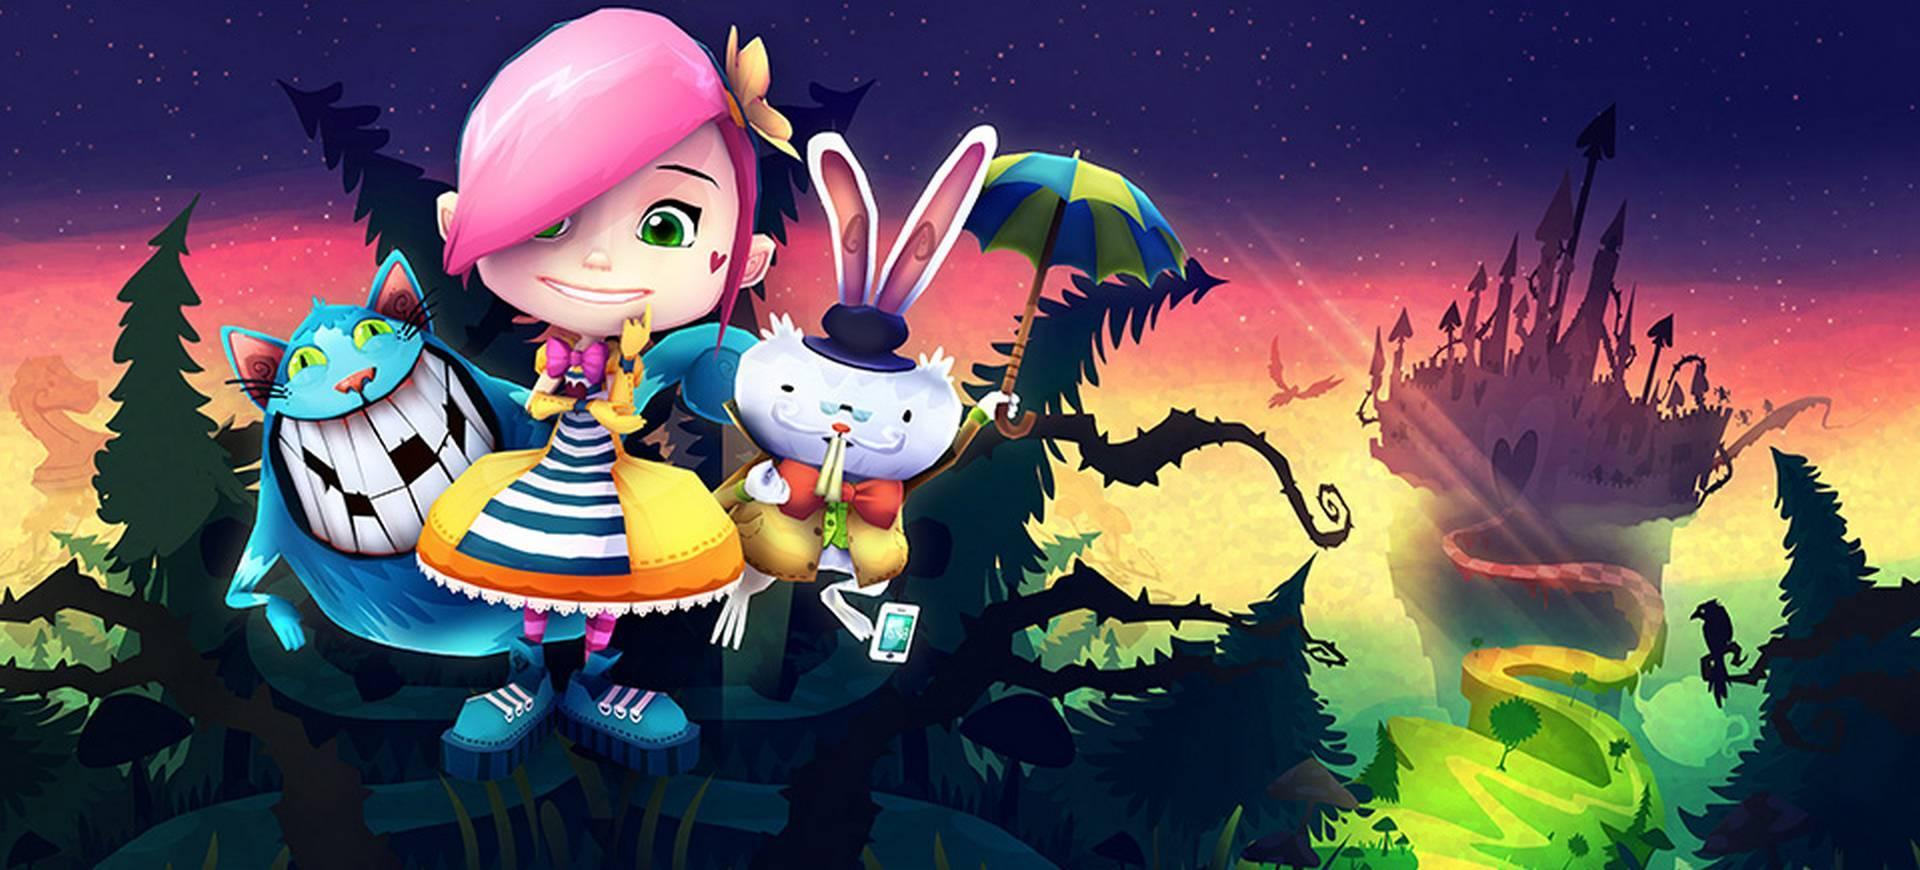 Alice in Wonderland: Golf Puzzle Adventures sắp đổ bộ lên Android - Tin Game Mobile